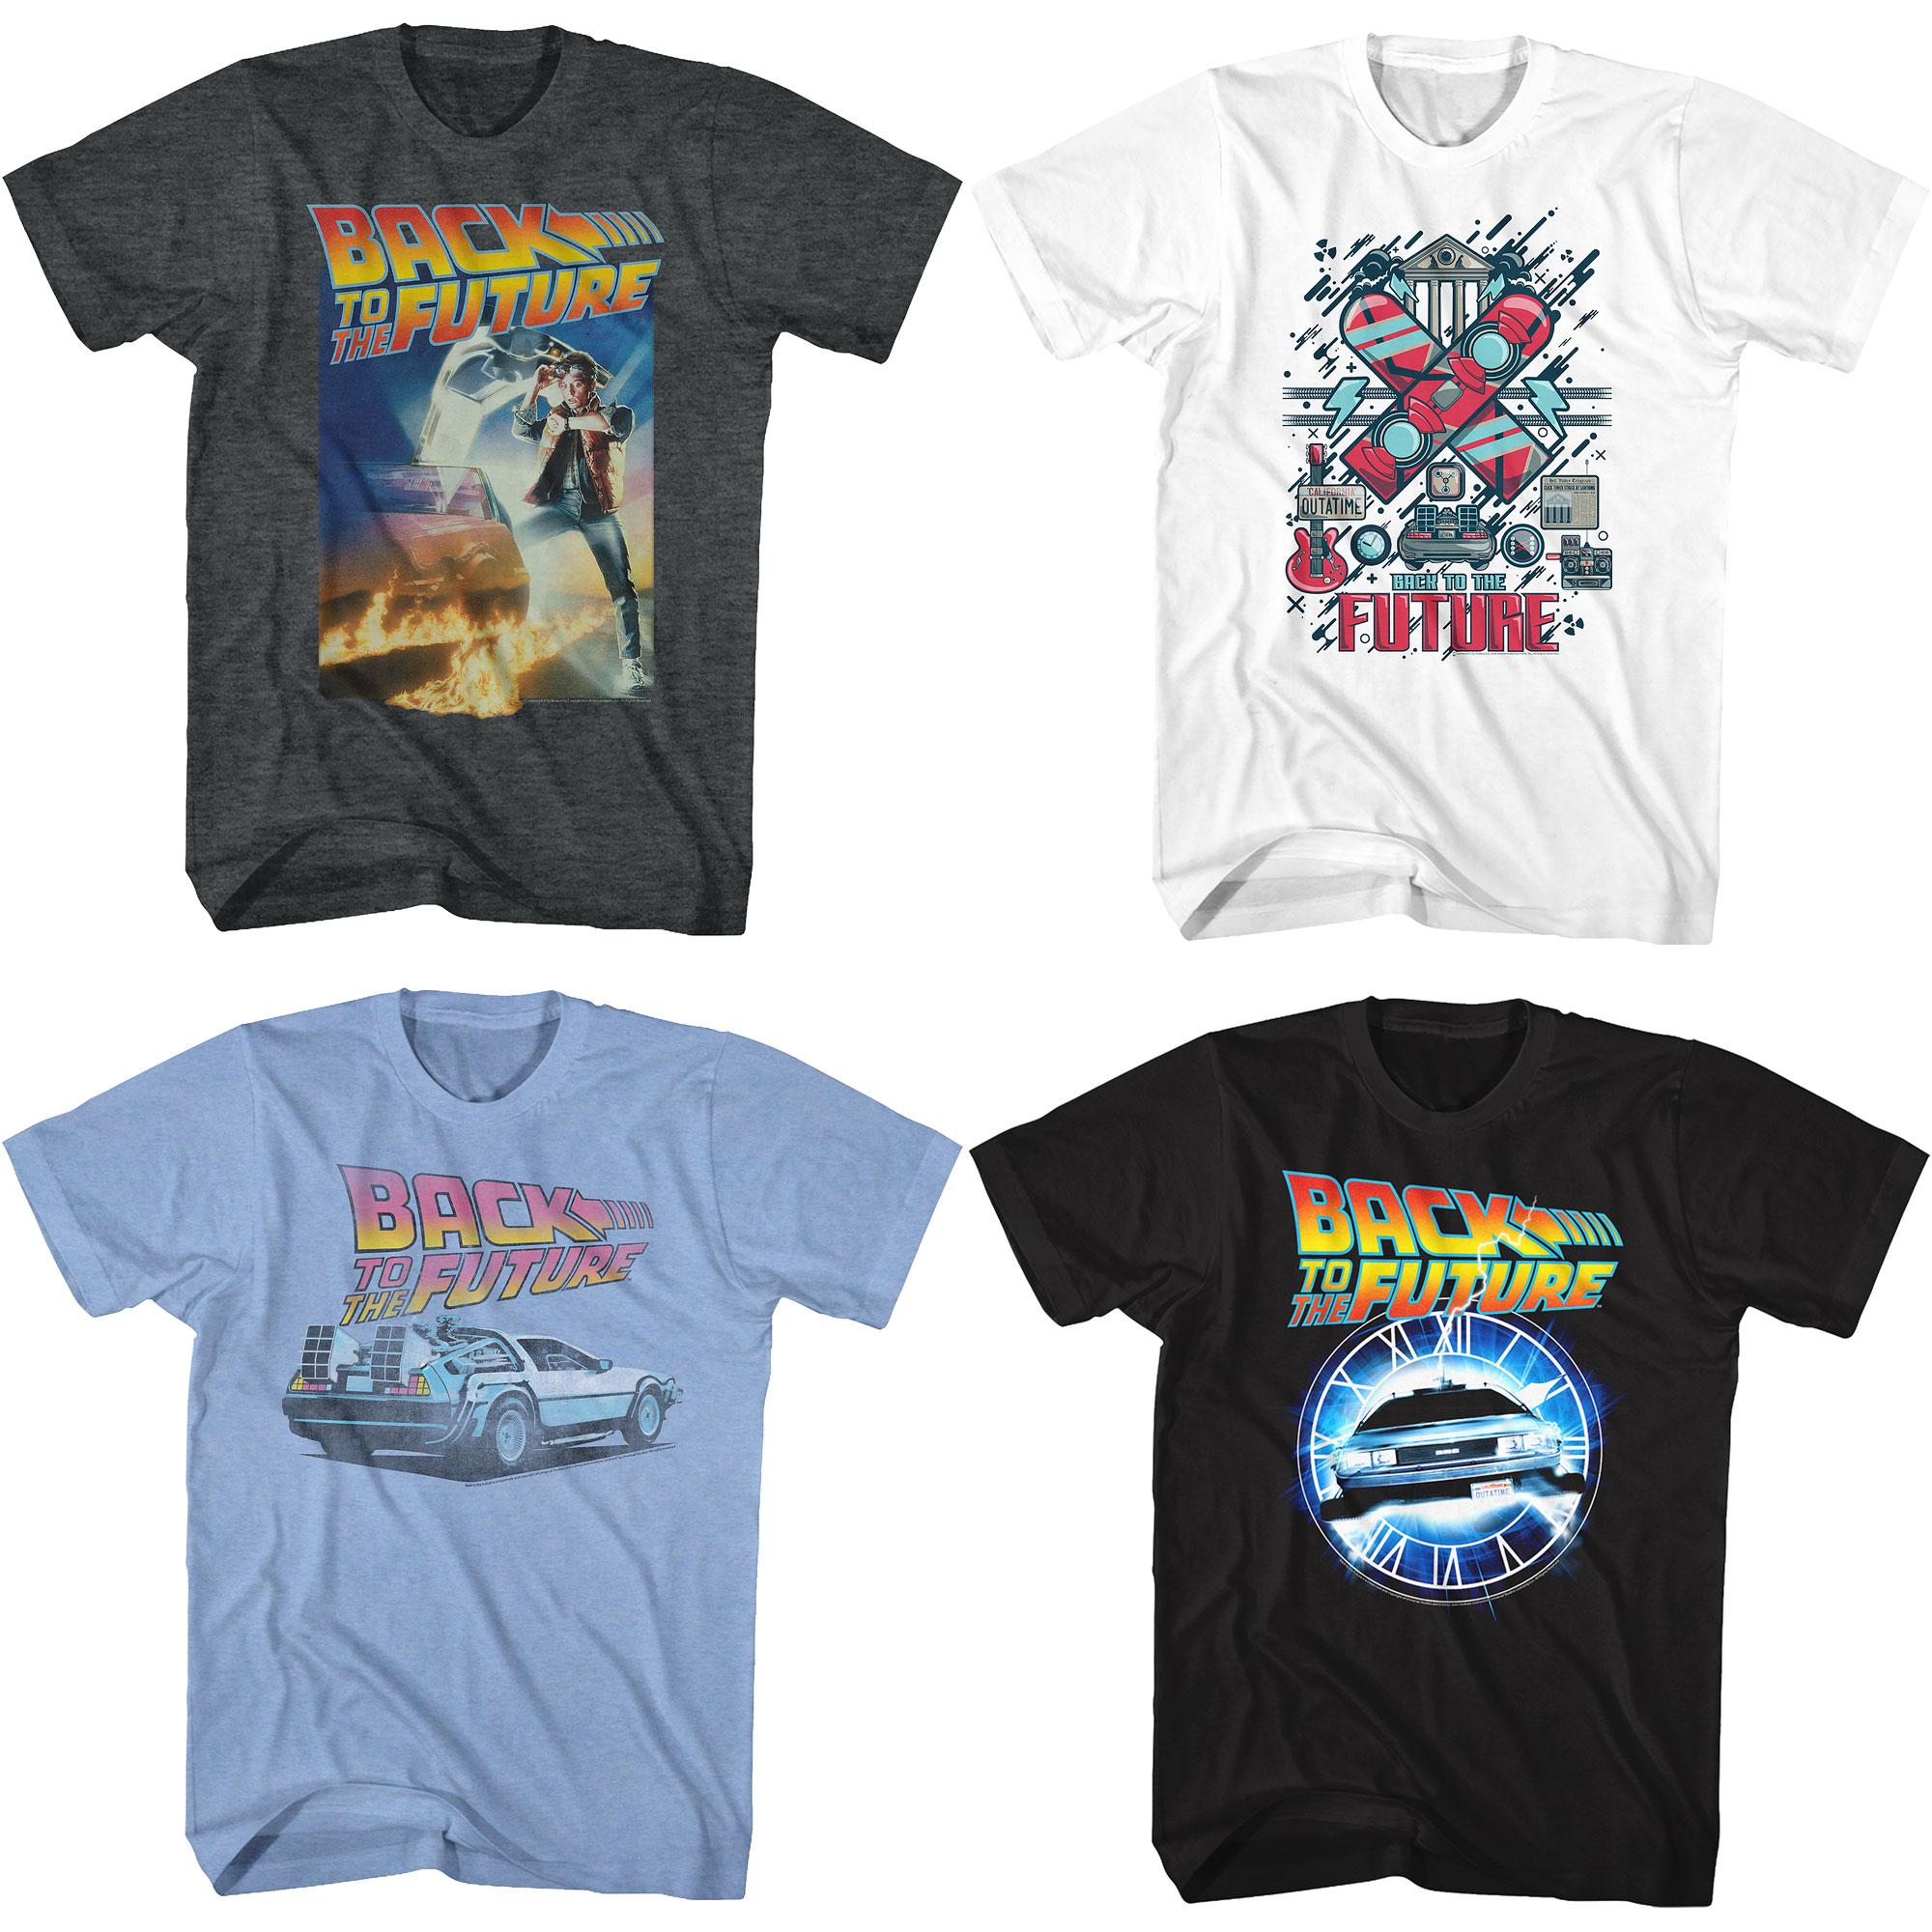 nike-adapt-bb-2-mag-back-to-the-future-shirts